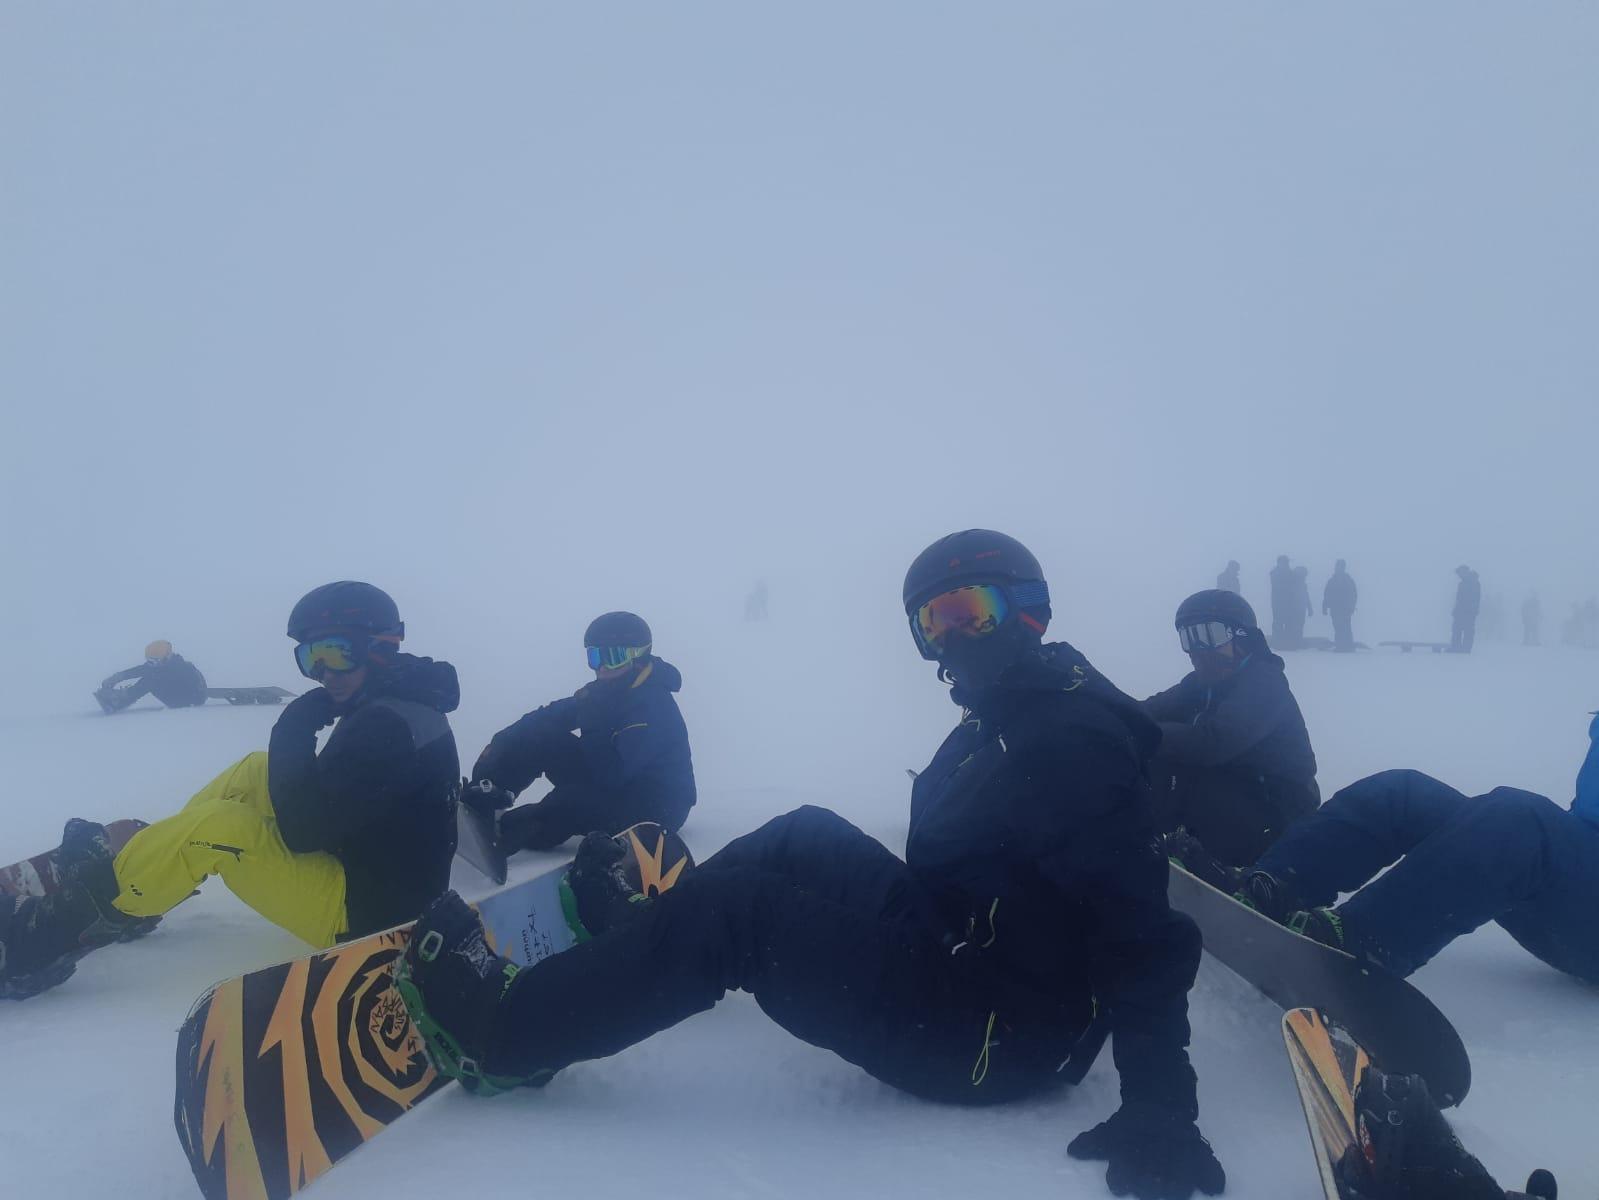 2Grupo Snow